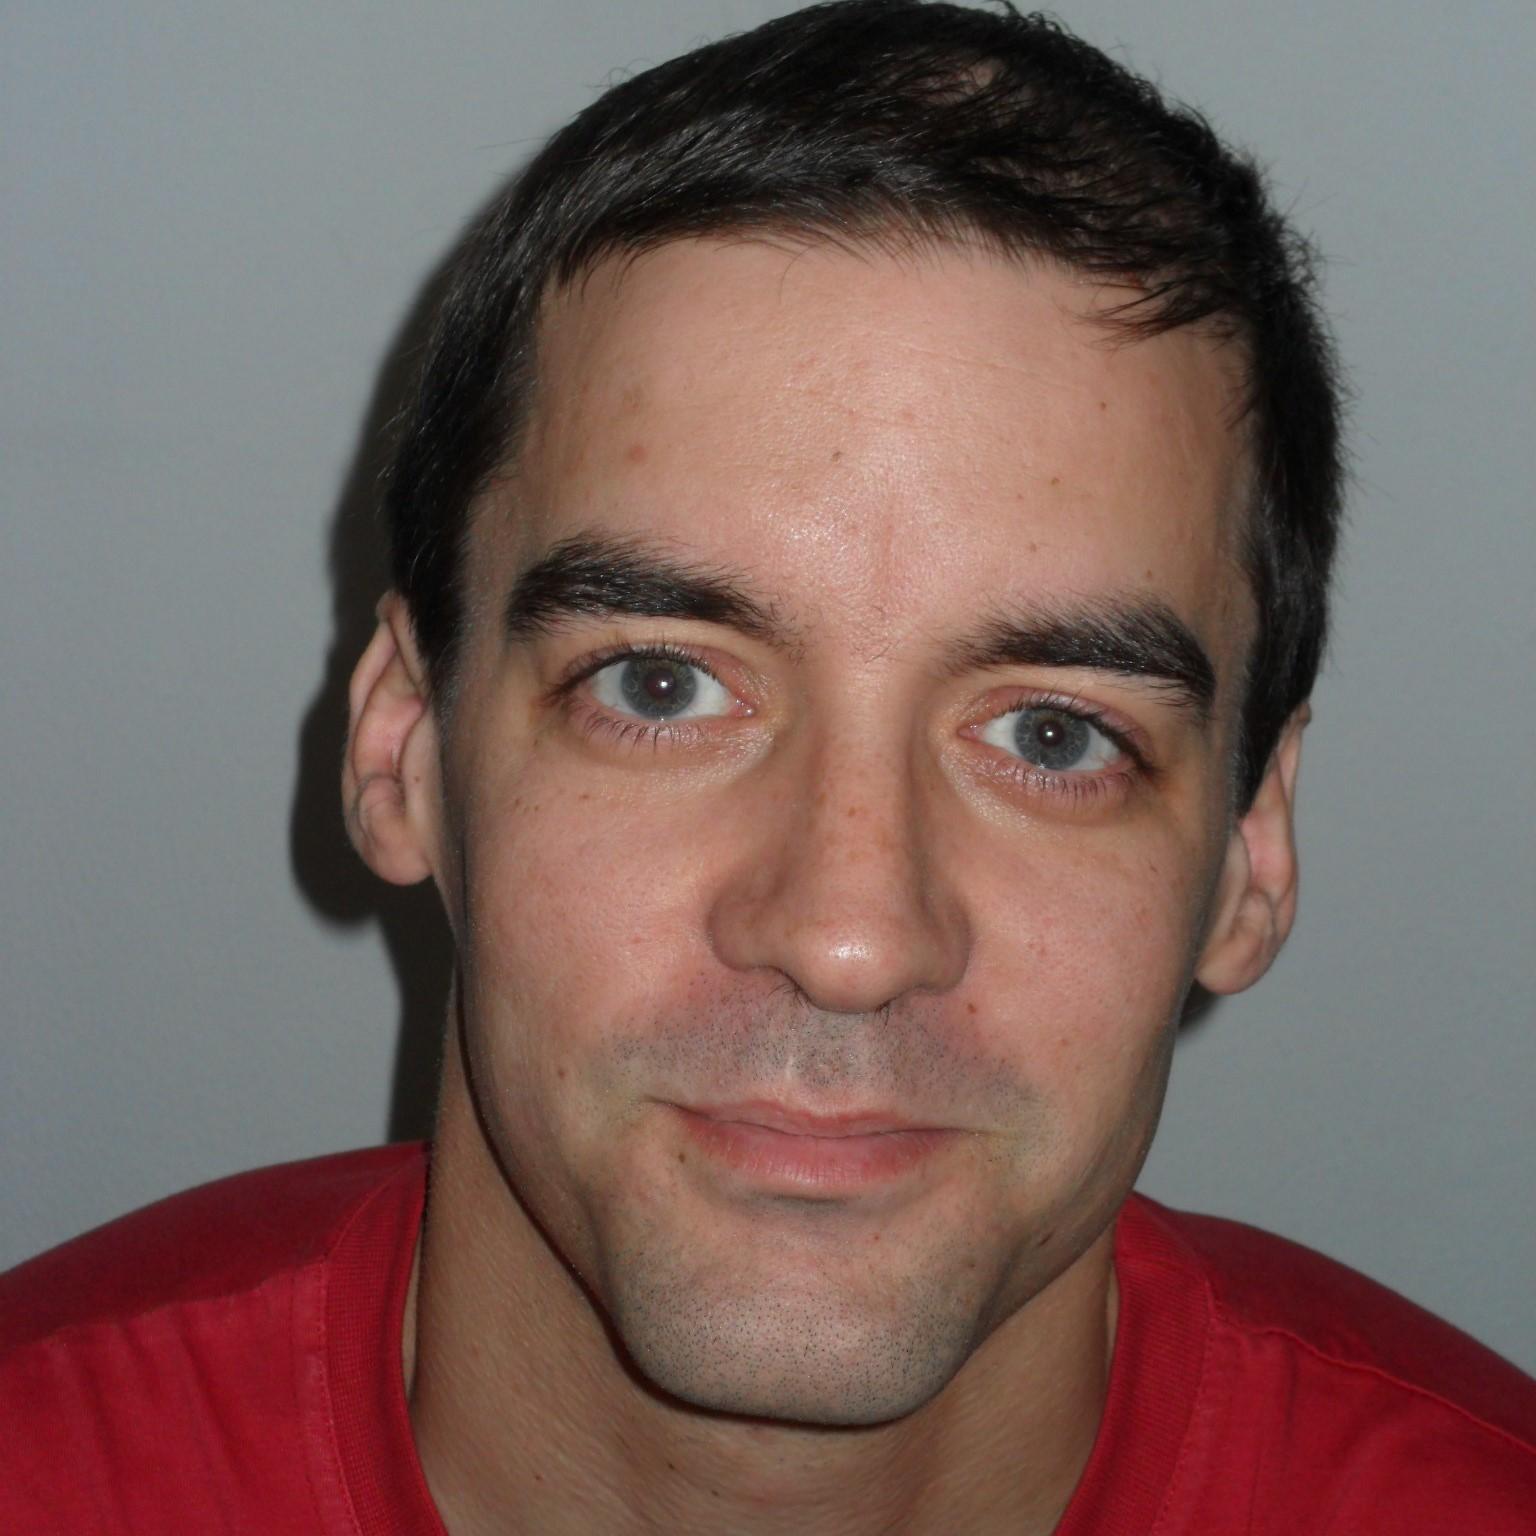 Paulo Ferreiro